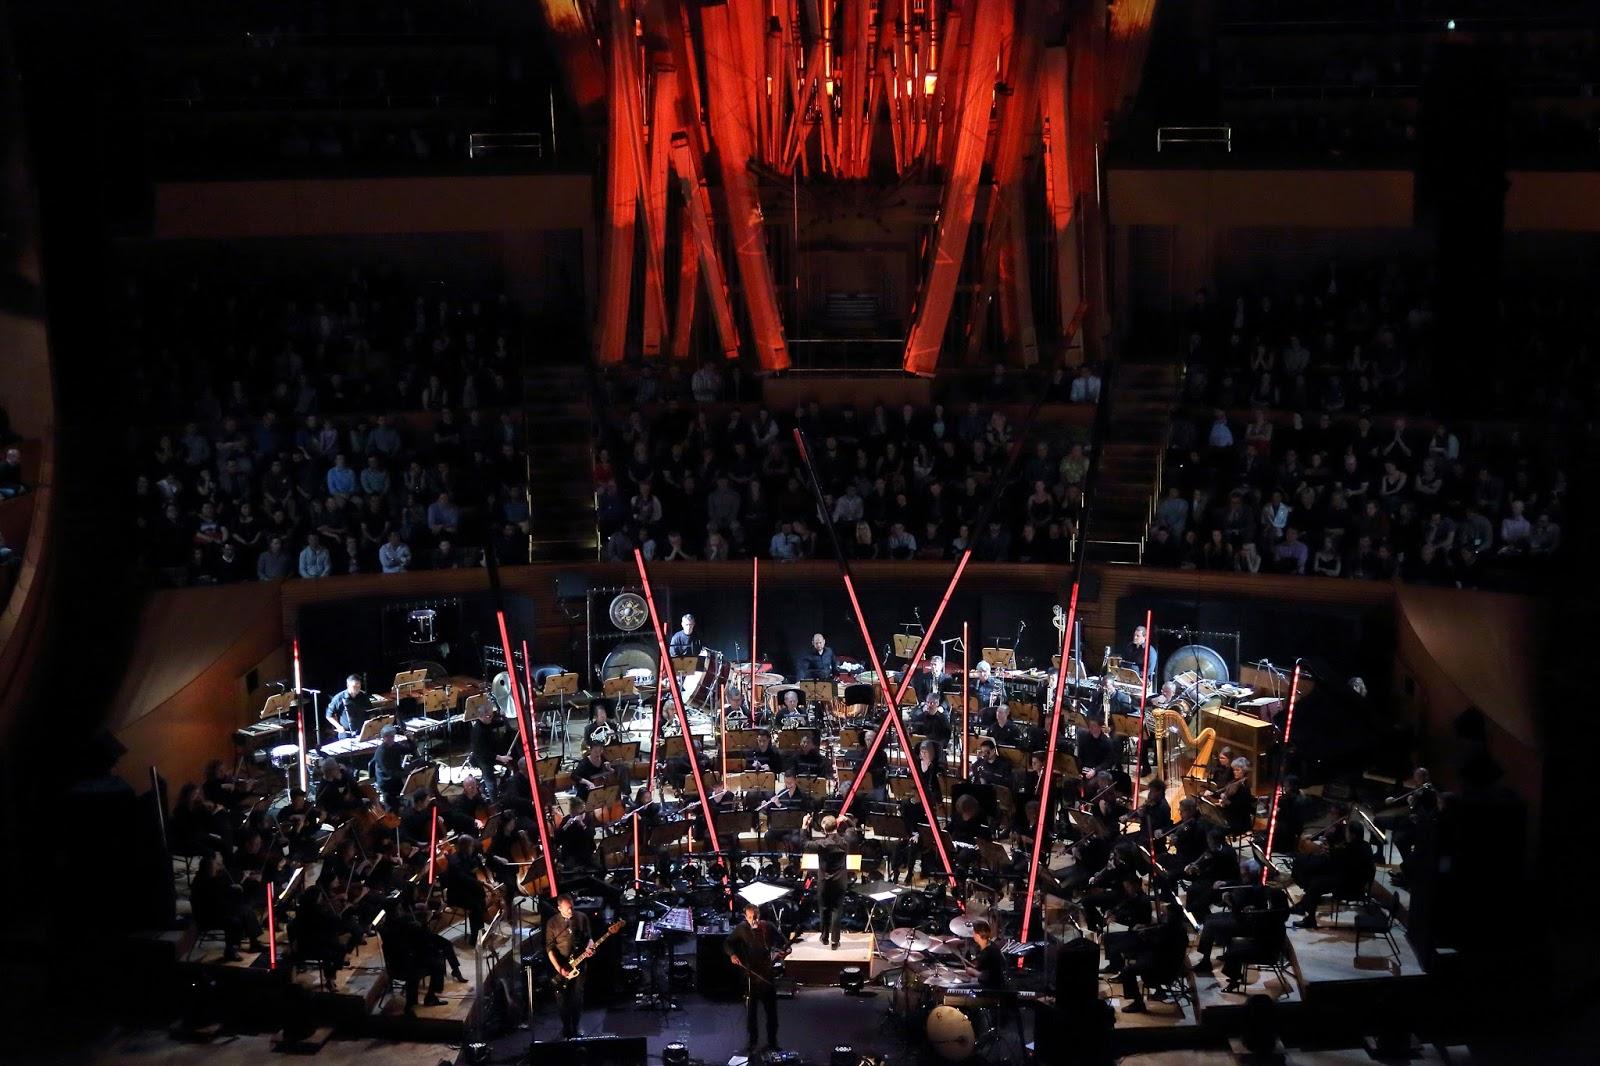 walt disney concert hall essay Frozen music by gil  gil garcetti's interpretive photographs of the steel skin of the walt disney concert hall evoke  frozen music is an essay in subtle.